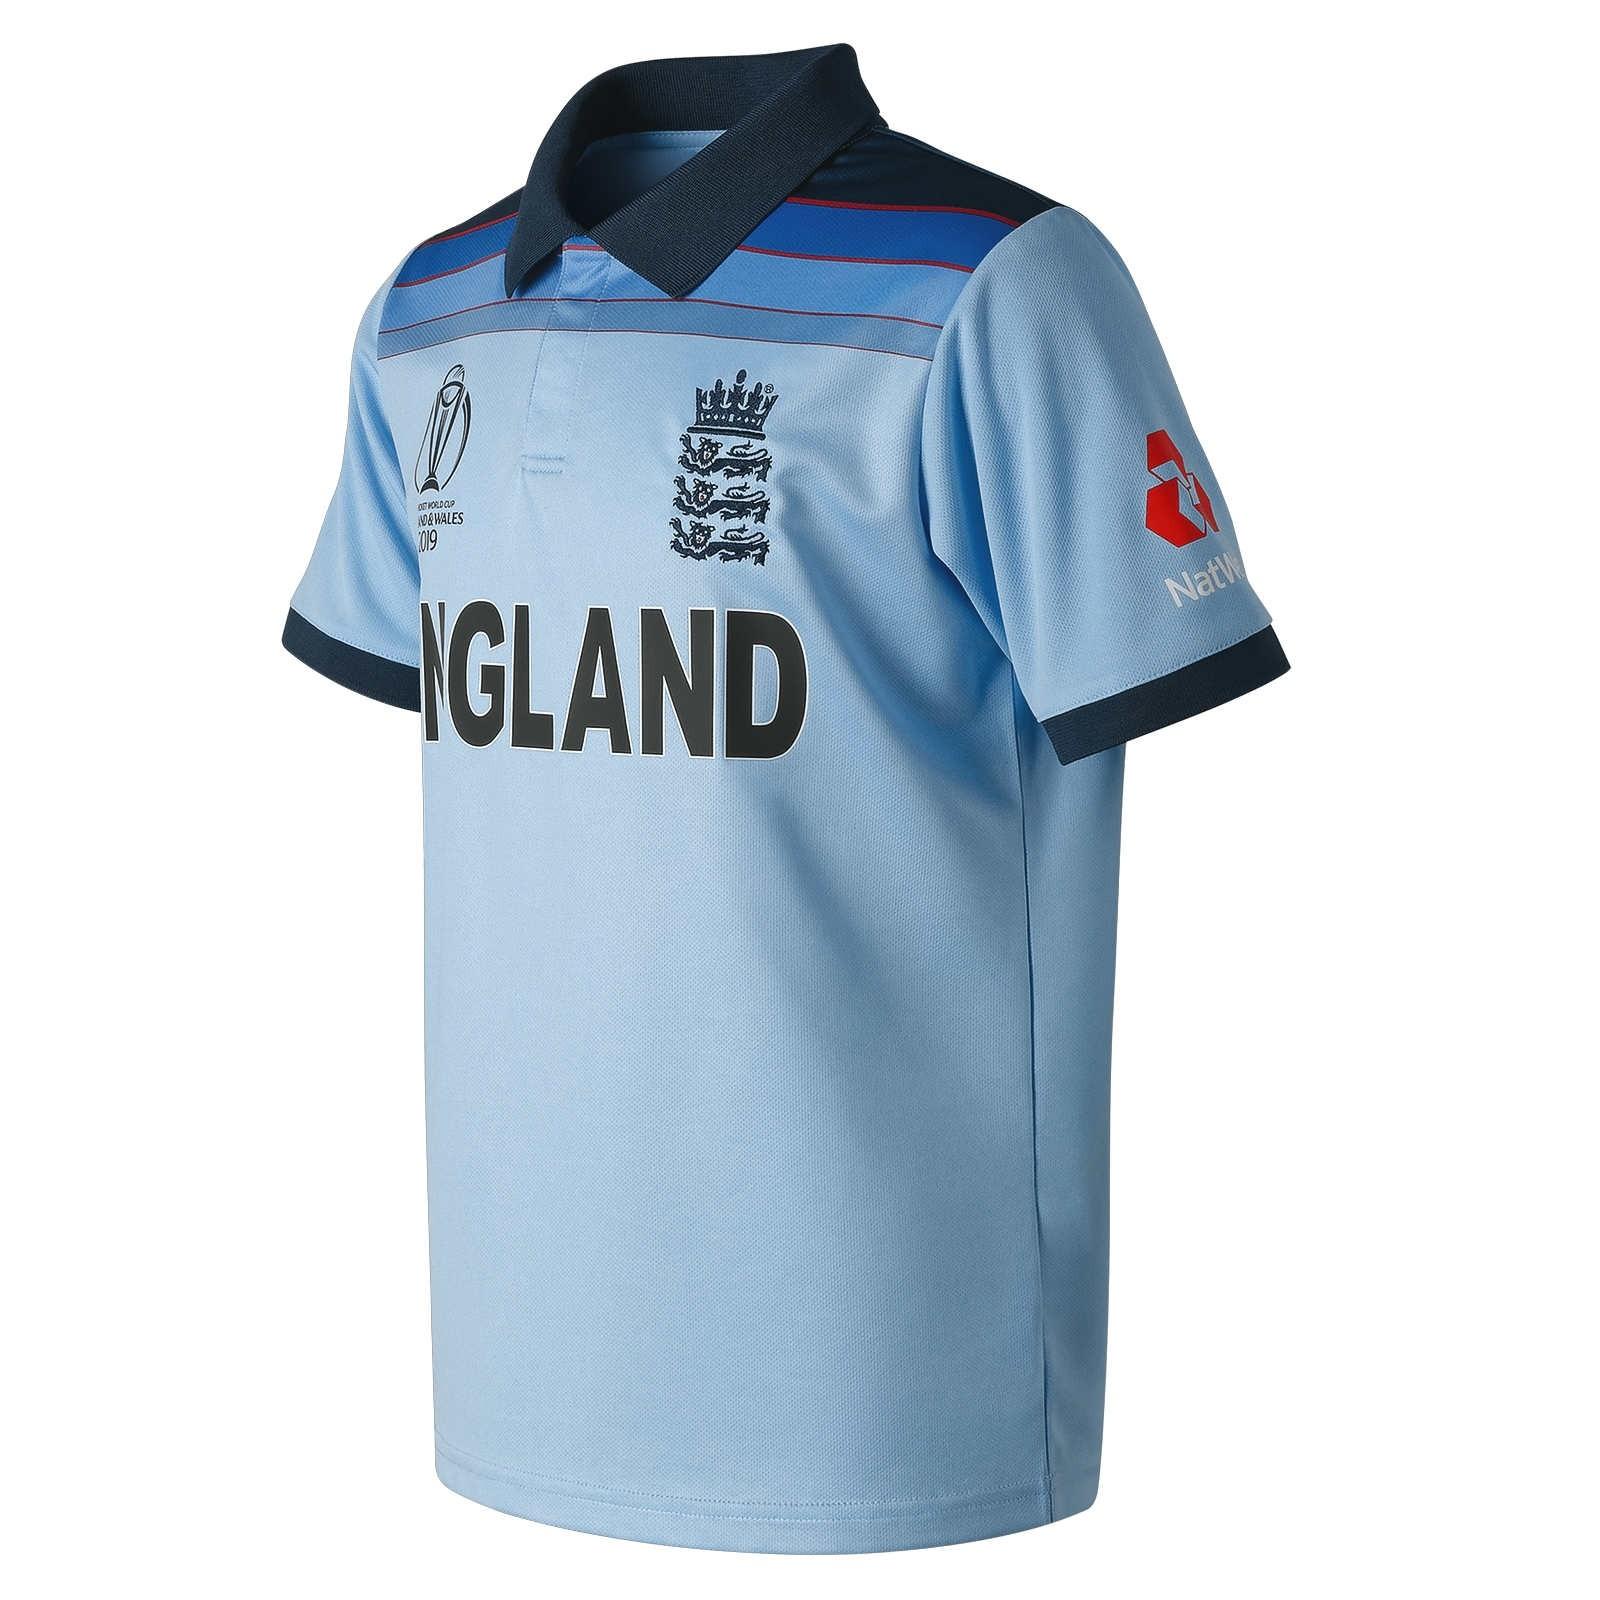 2019 New Balance England Cricket World Cup ODI Replica Junior Cricket Shirt